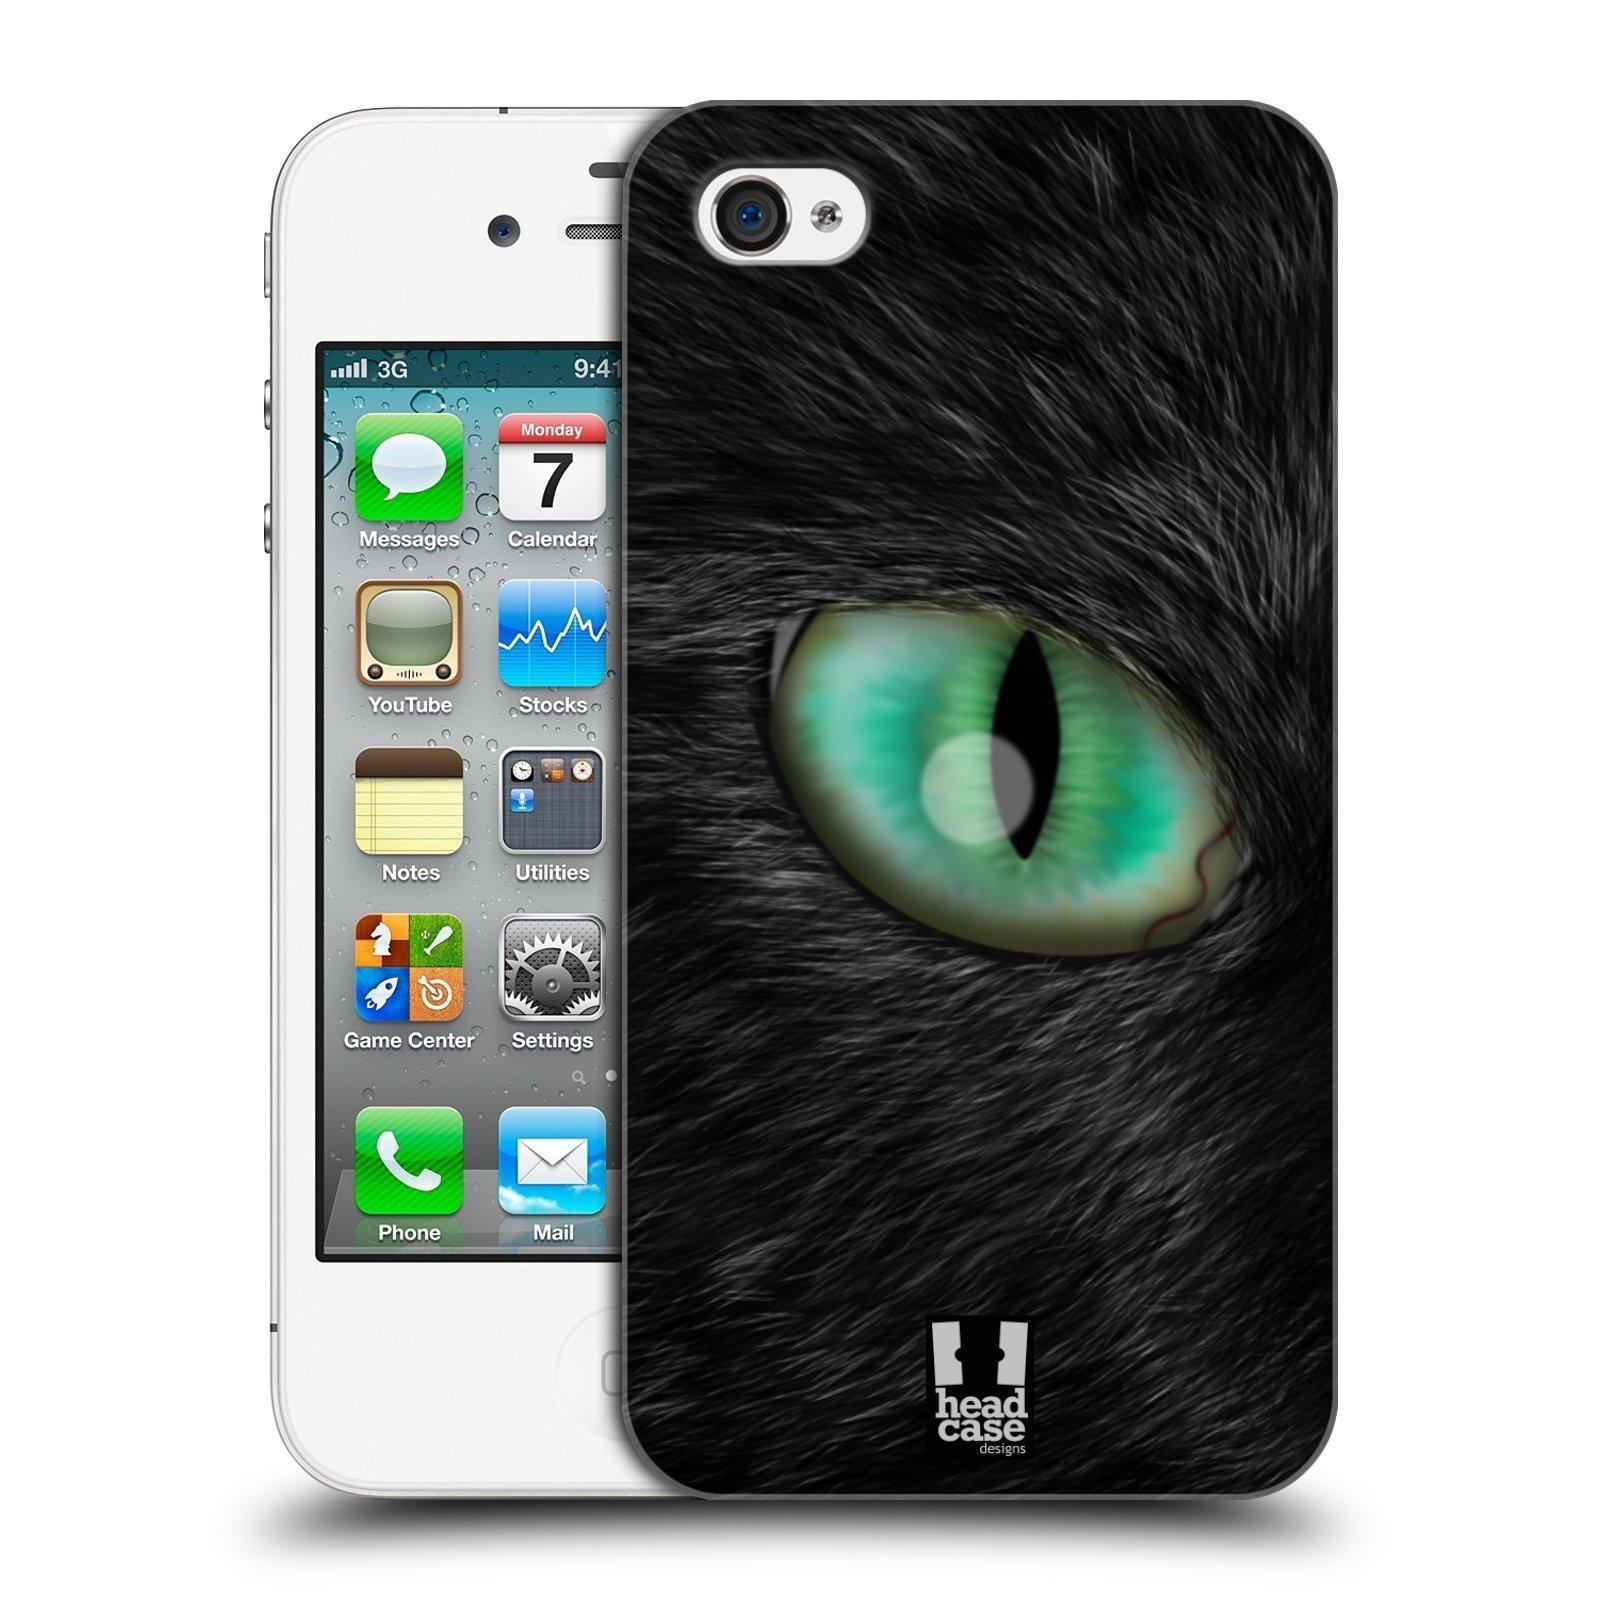 HEAD CASE plastový obal na mobil Apple Iphone 4/4S vzor pohled zvířete oko kočka